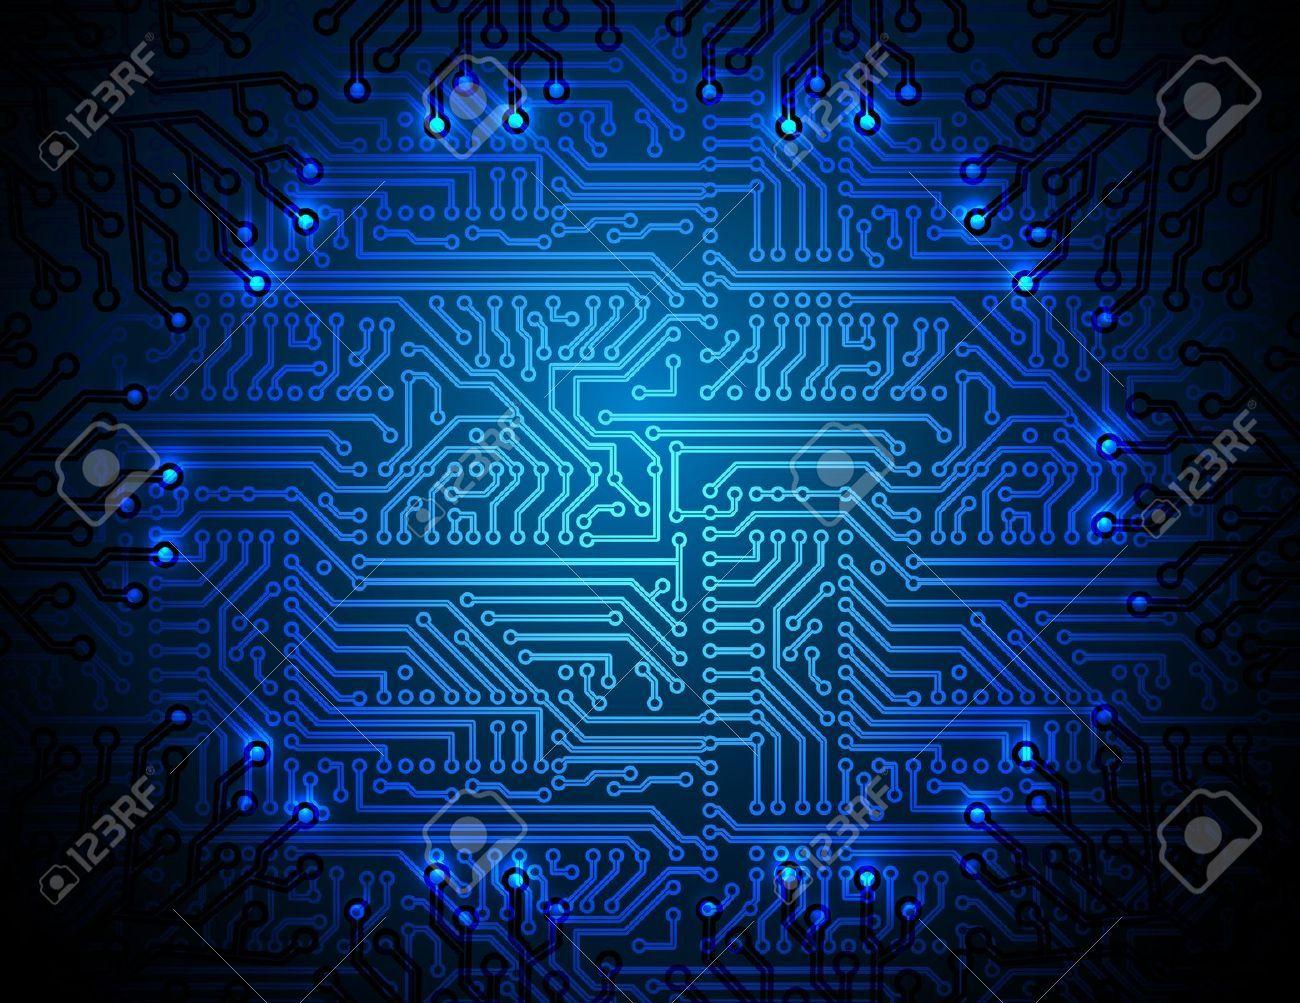 Circuit board background | Circuit Art & Architecture | Pinterest ...